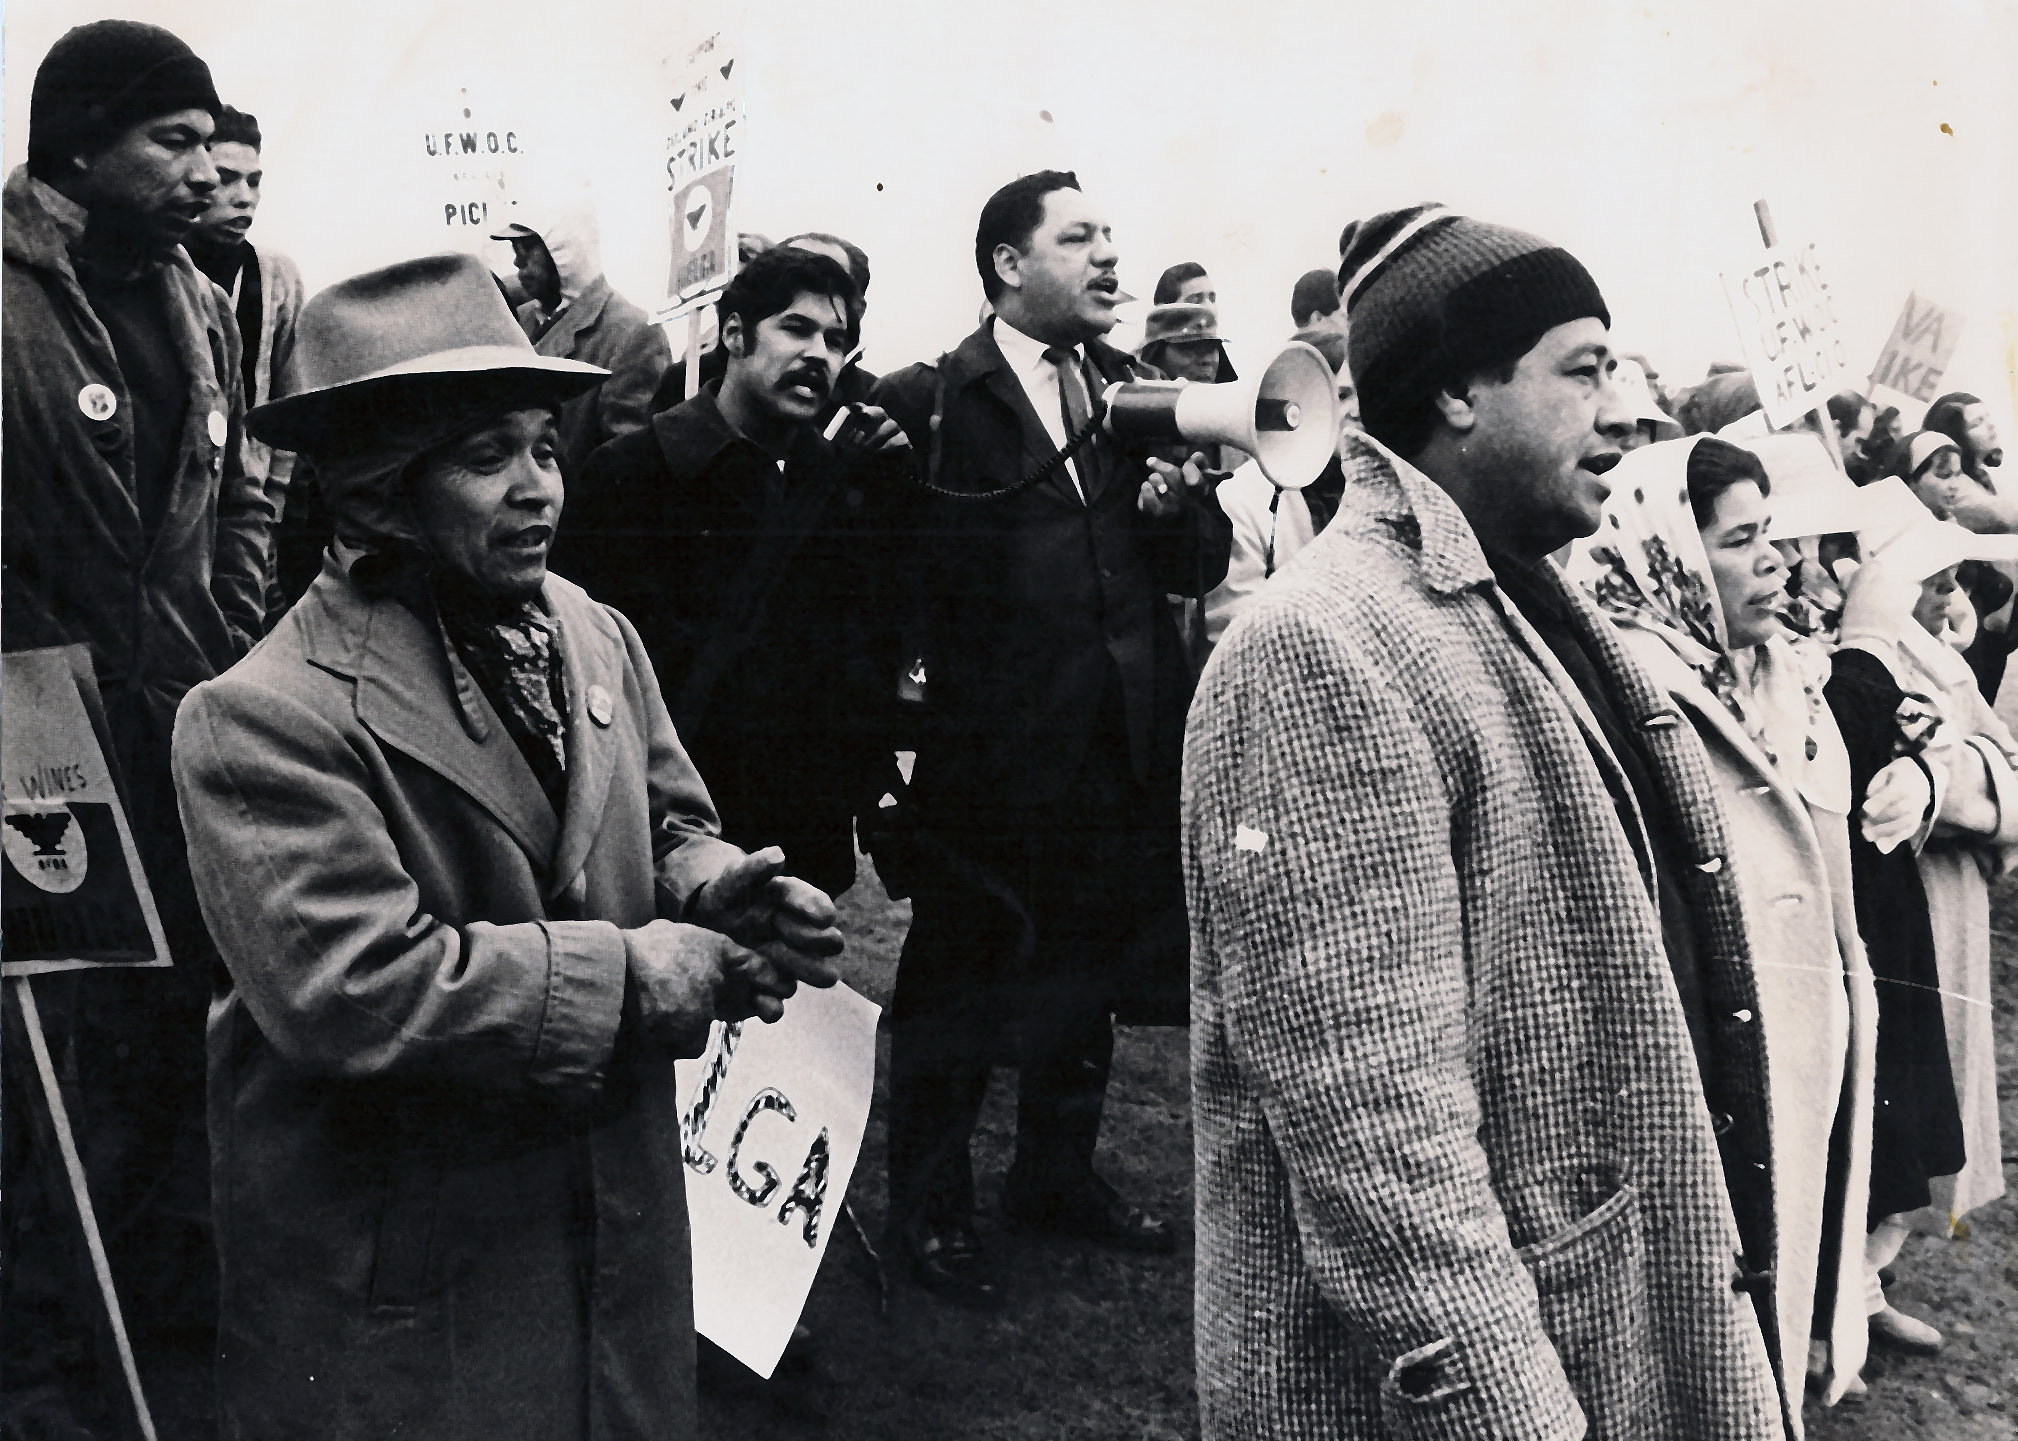 Luis & Cesar - Picket Line 1965